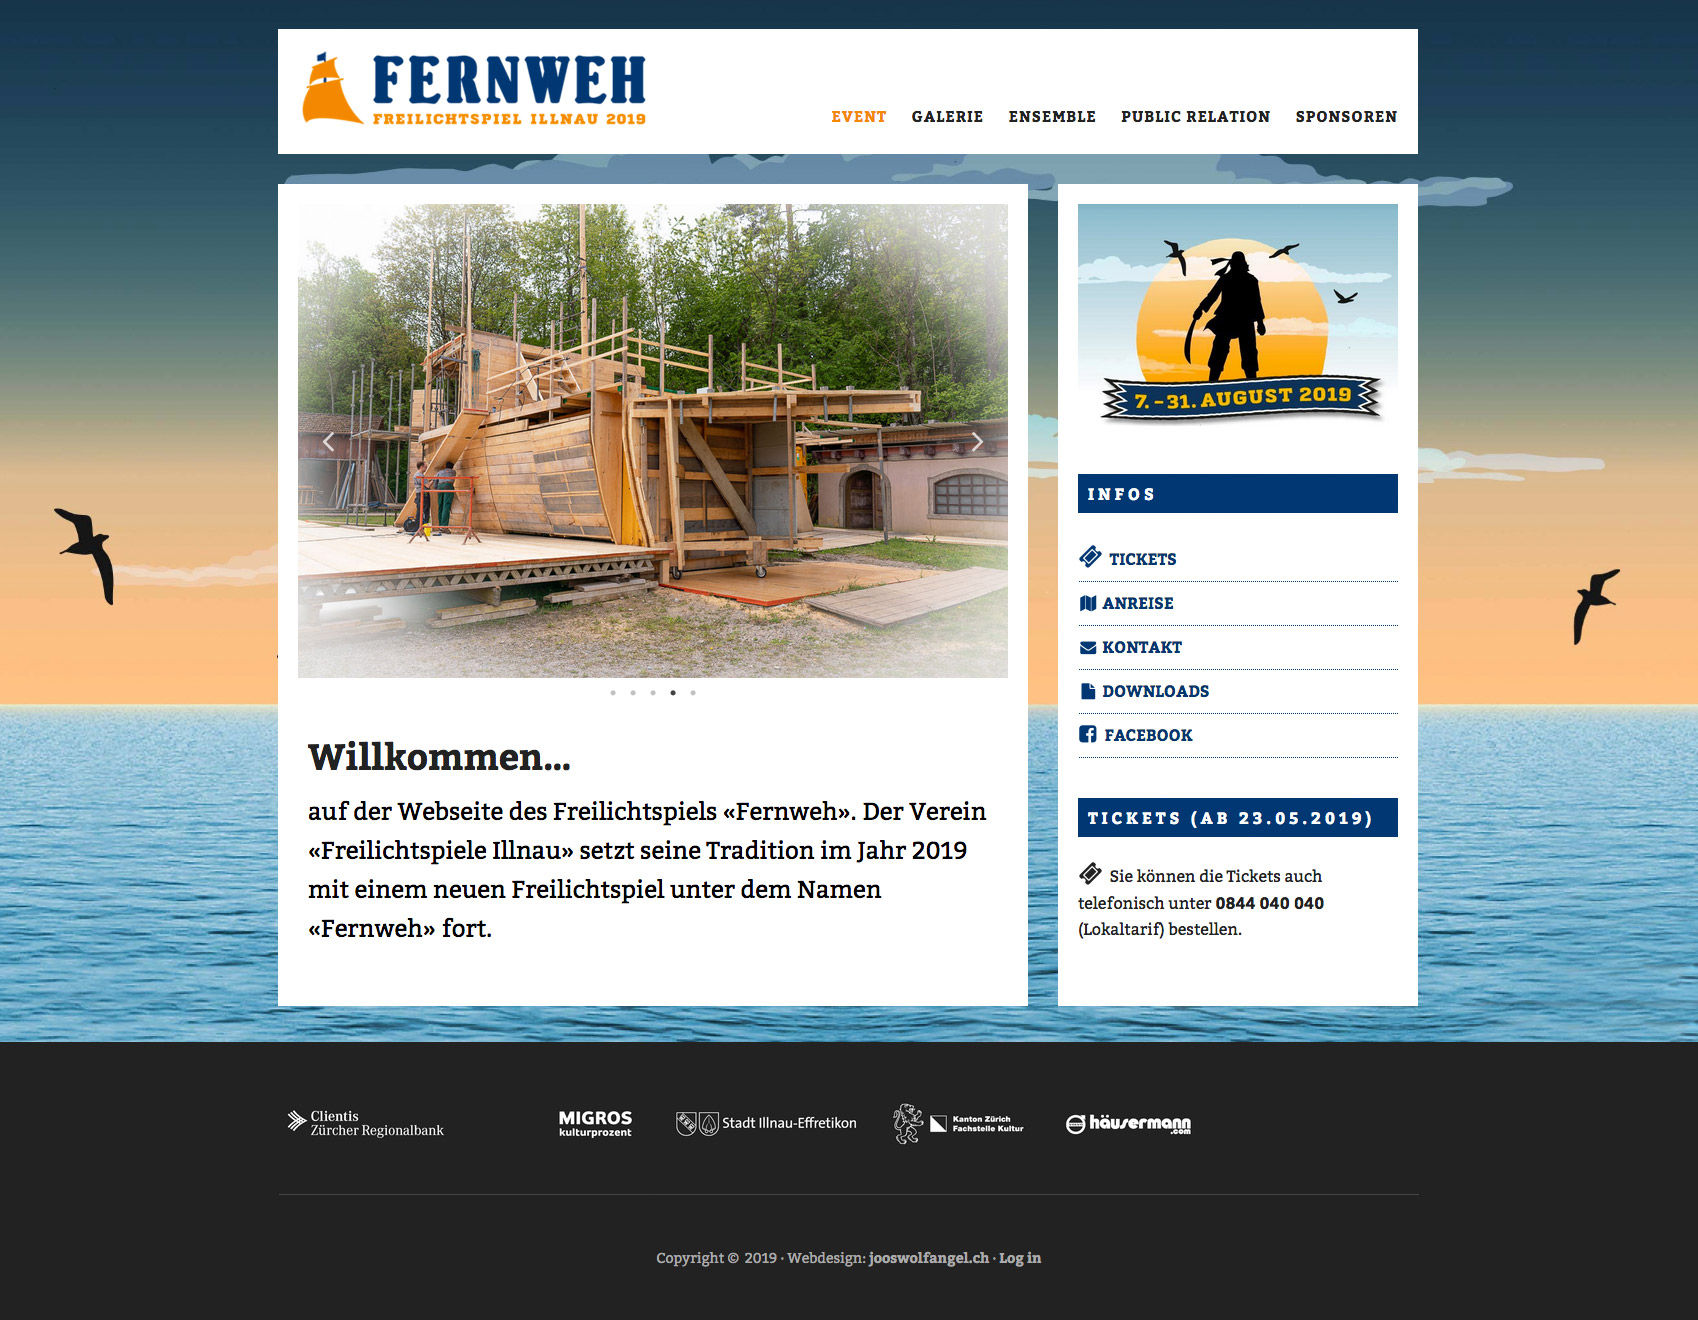 fernweh-home.jpg